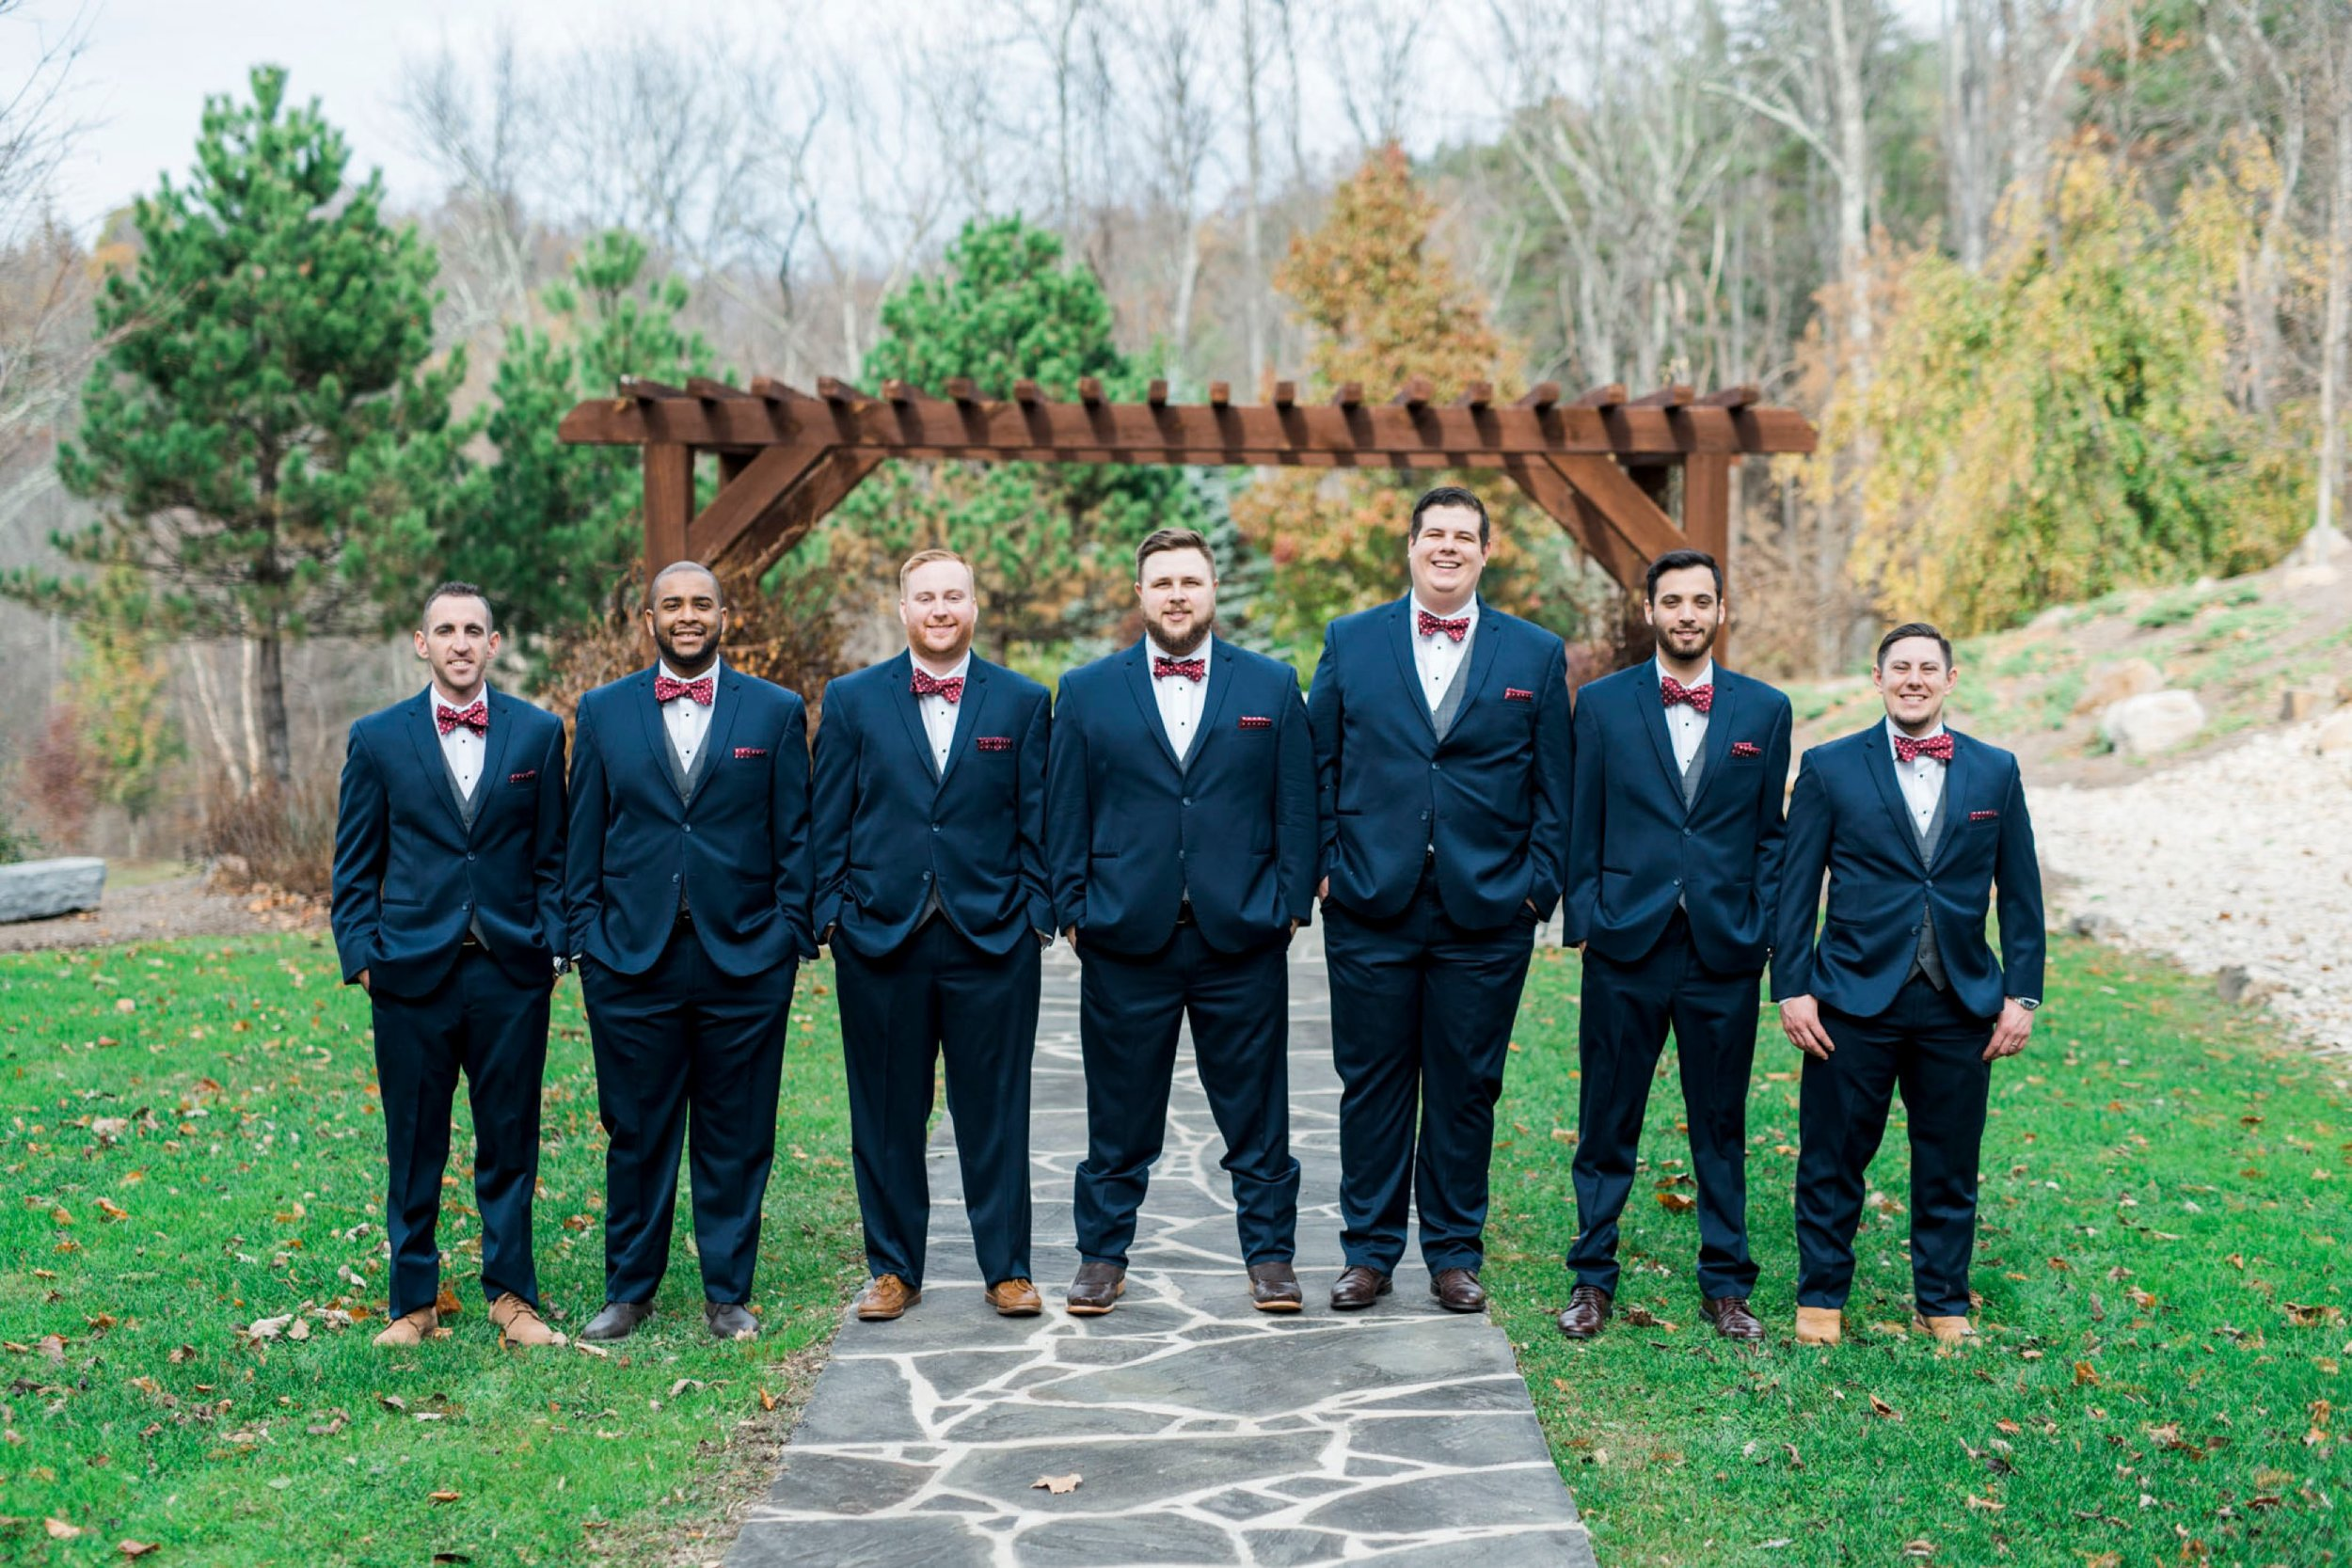 IrvineEstate_LexingtonVA_Wedding_FallWedding_VirginiaWeddingPhotographer 24.jpg